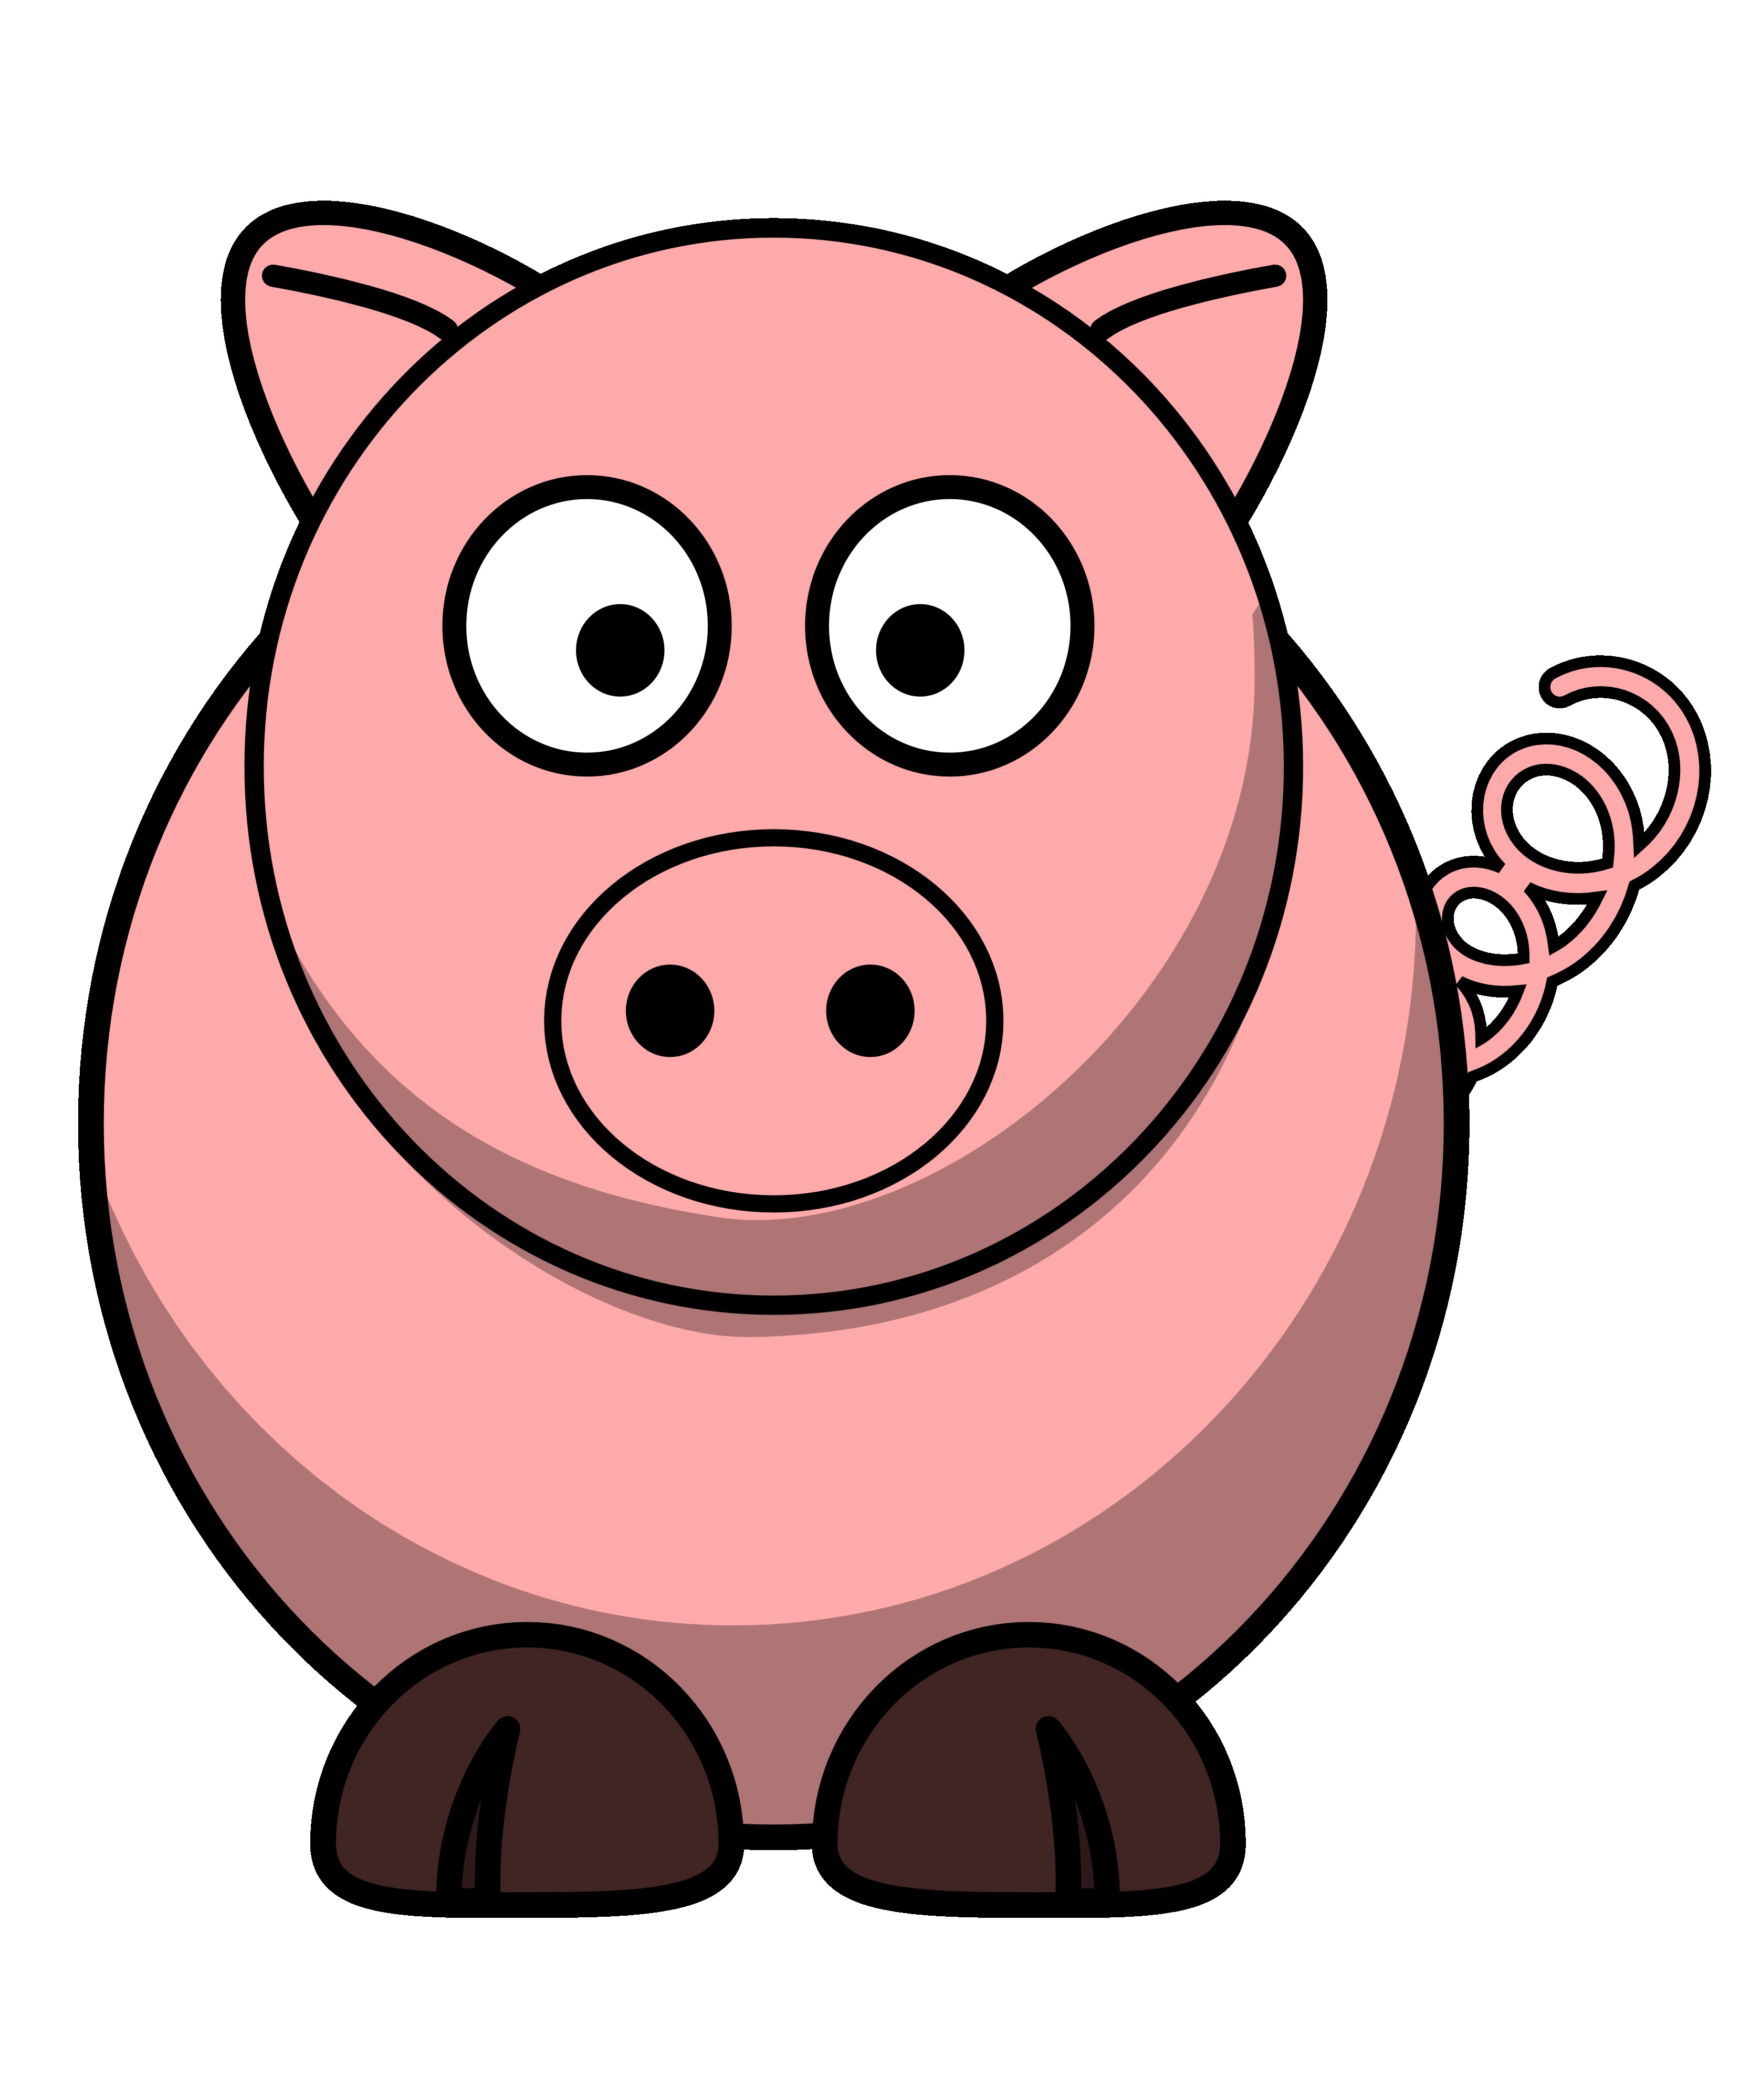 Pigs clipart. Pig clip art cartoon